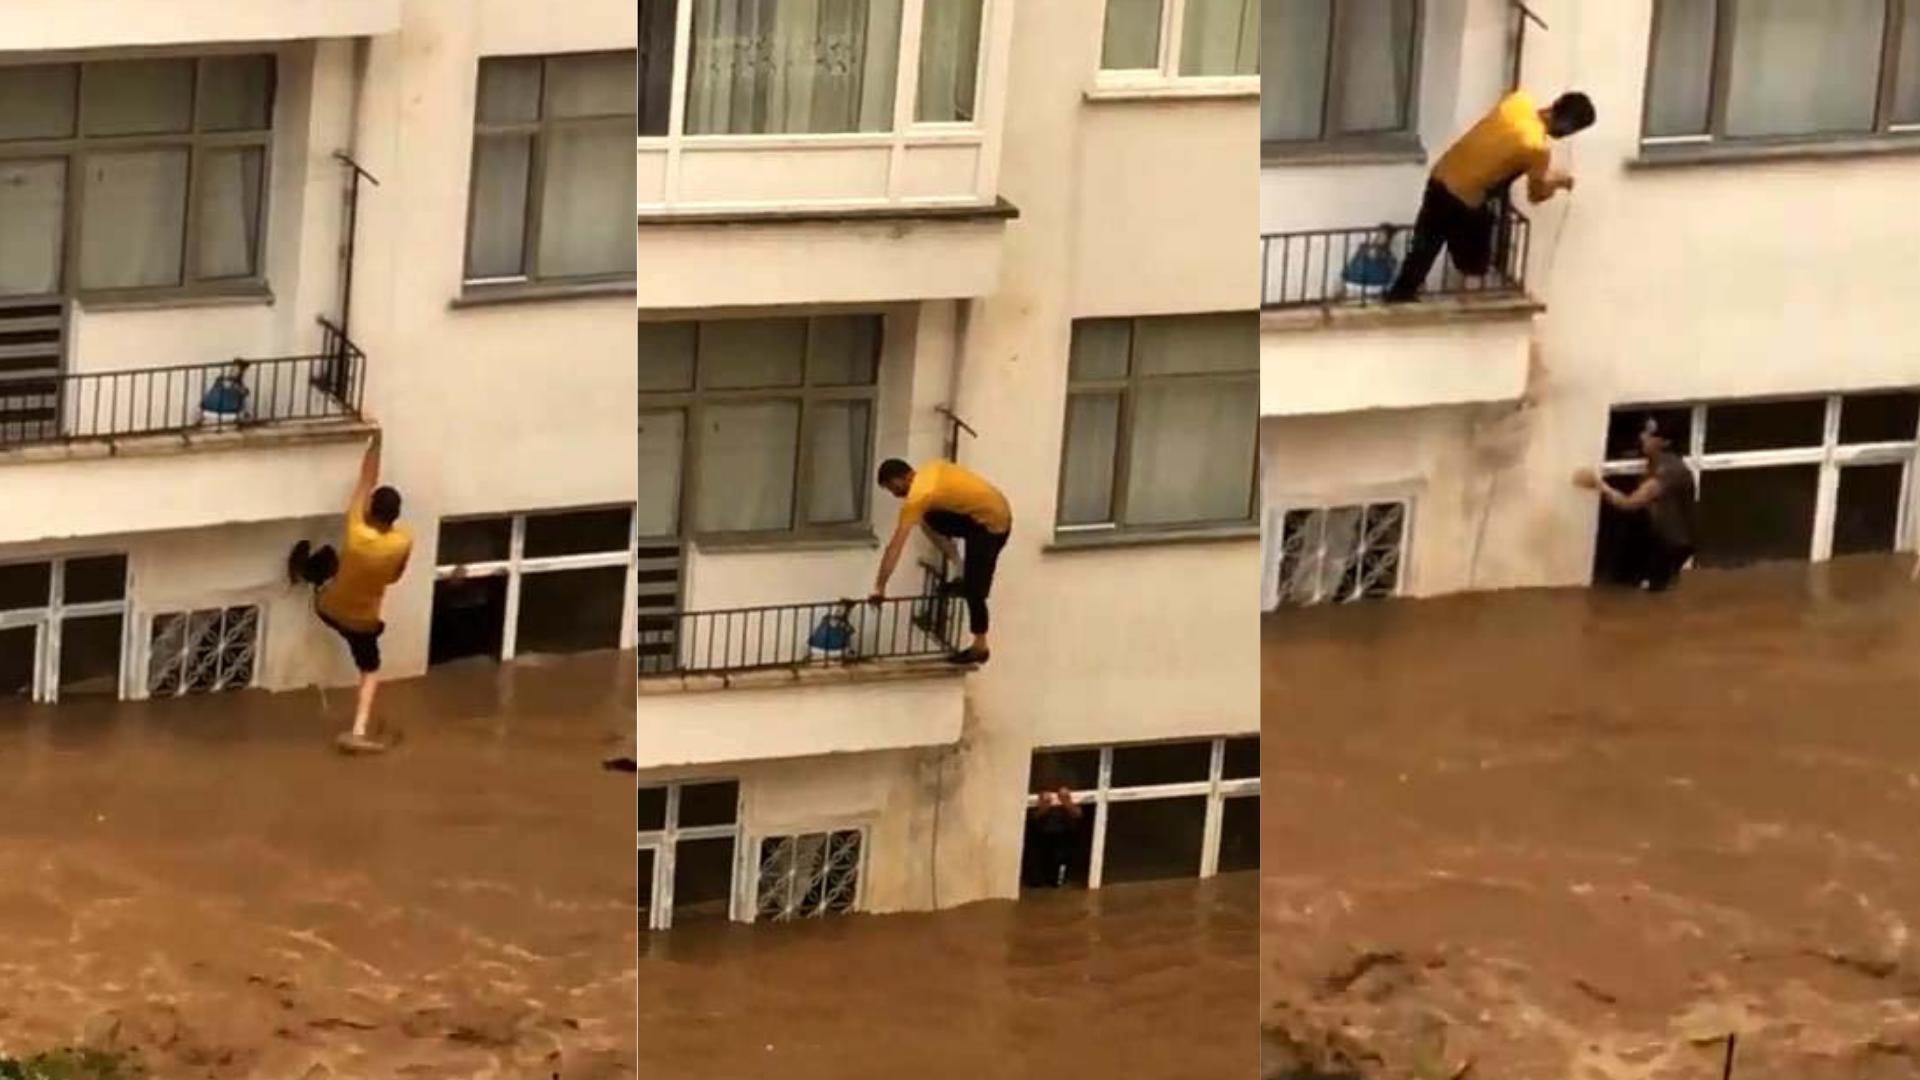 Photo of Թուրքիայում ջրհեղեղի հետևանքով տներ են անցել ջրի տակ